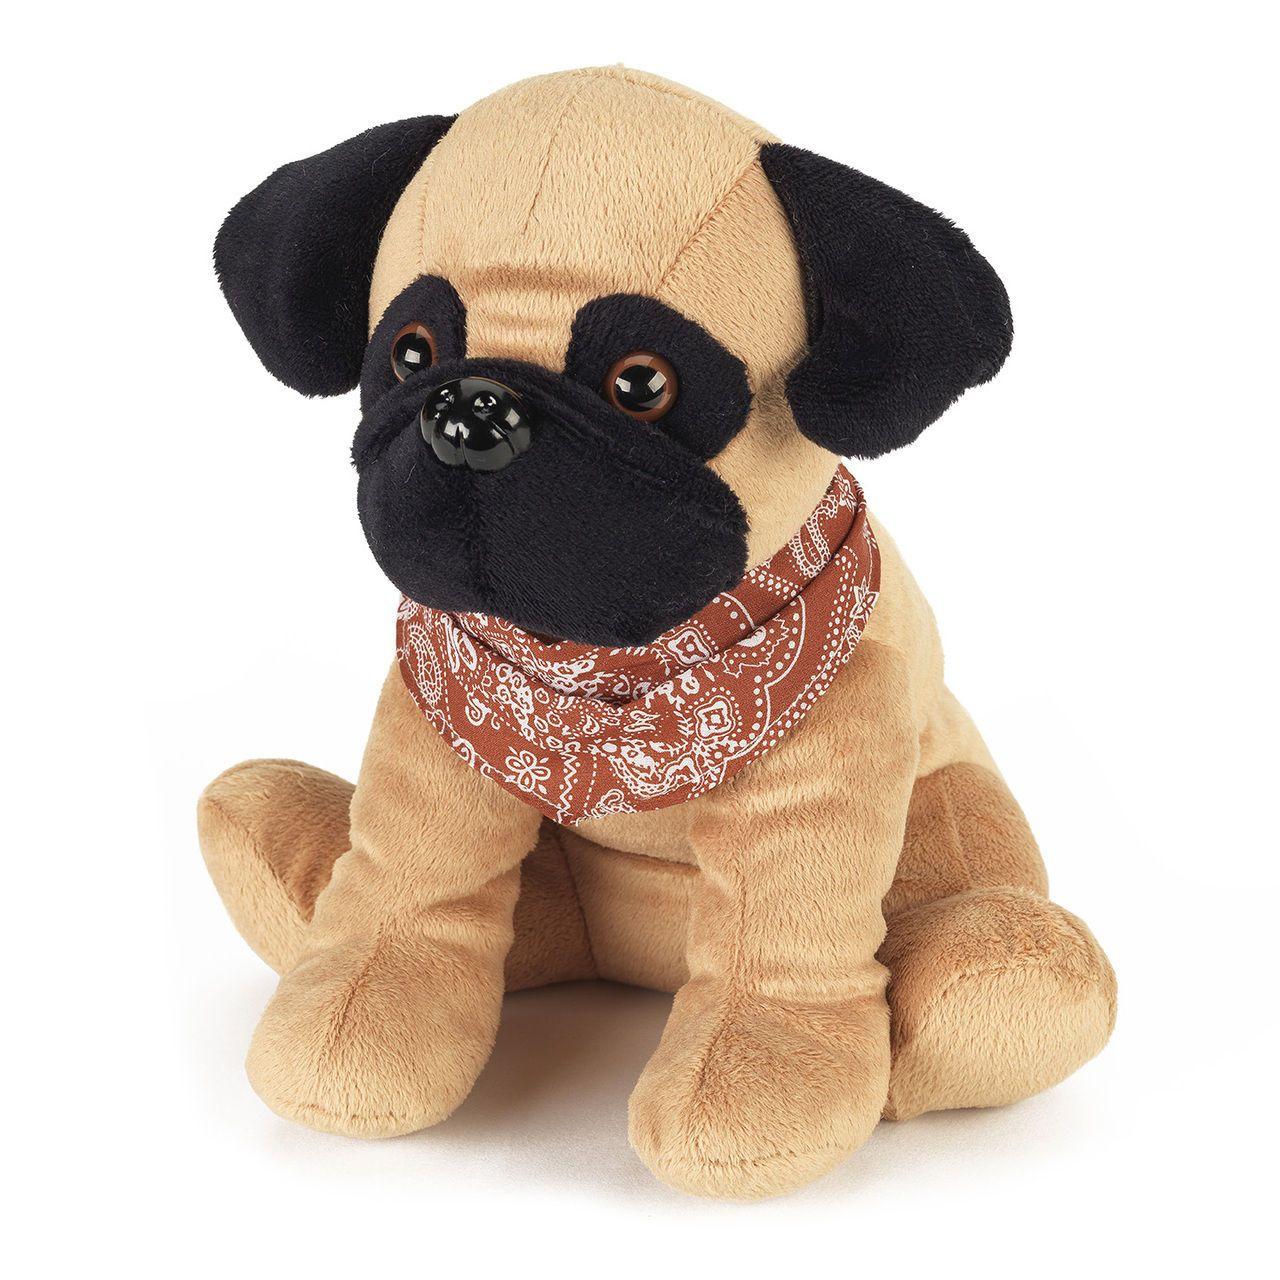 Cozy Plush Pets Microwavable Heatable Pugsy The Pug Soft